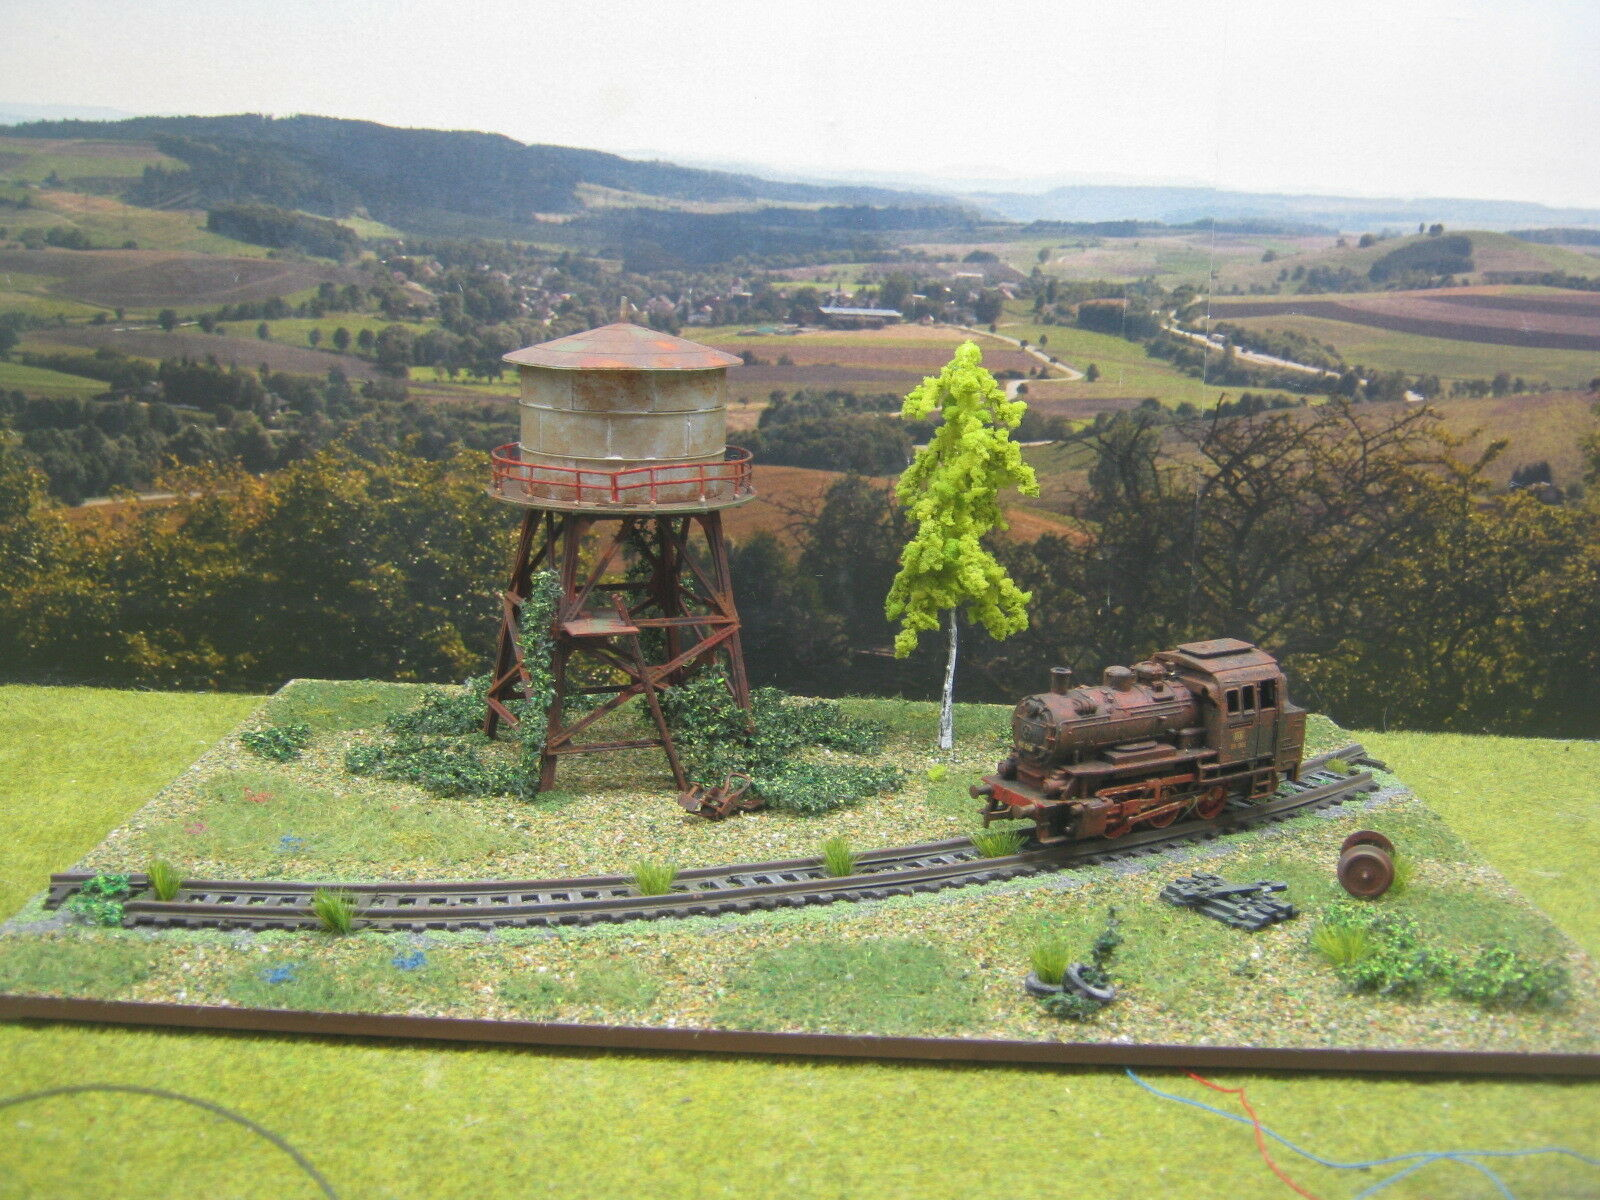 Lost places  LOK torre de agua LED modellbau paisajismo diorama h0 1 87  103